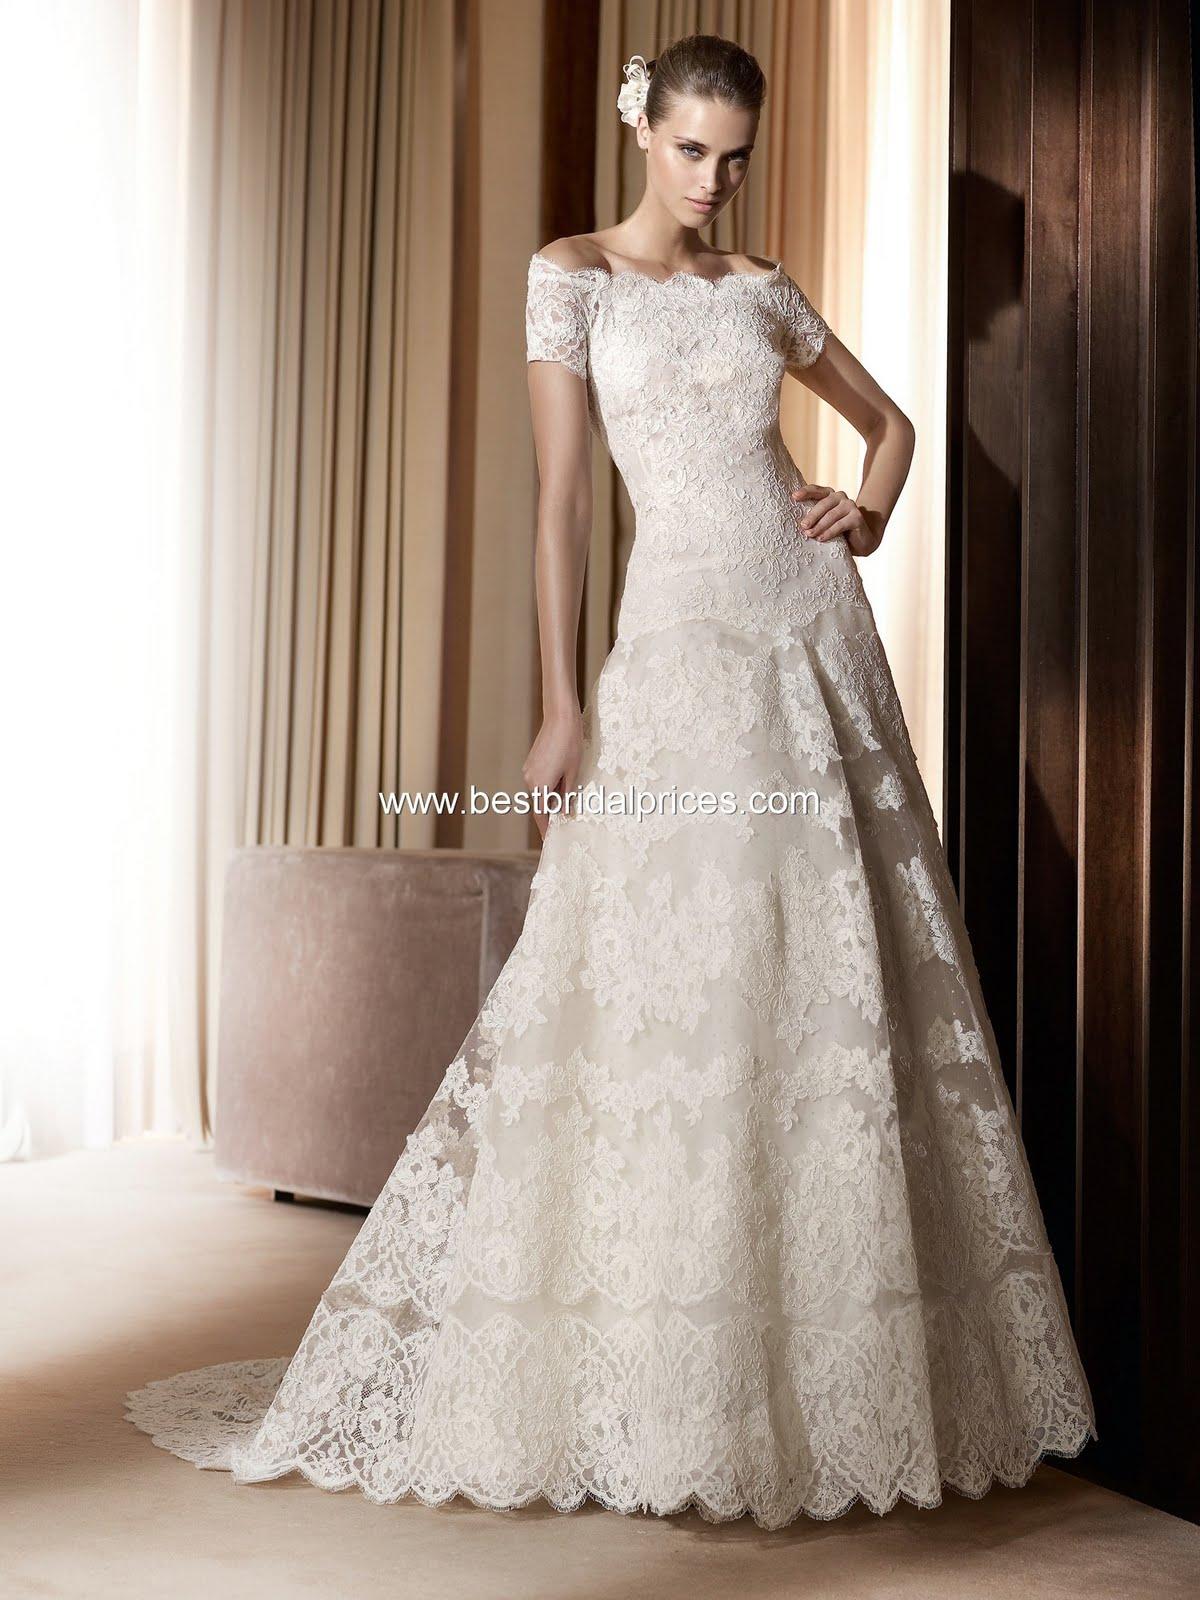 Superb Wedding Dresses 24 Vintage So here are some